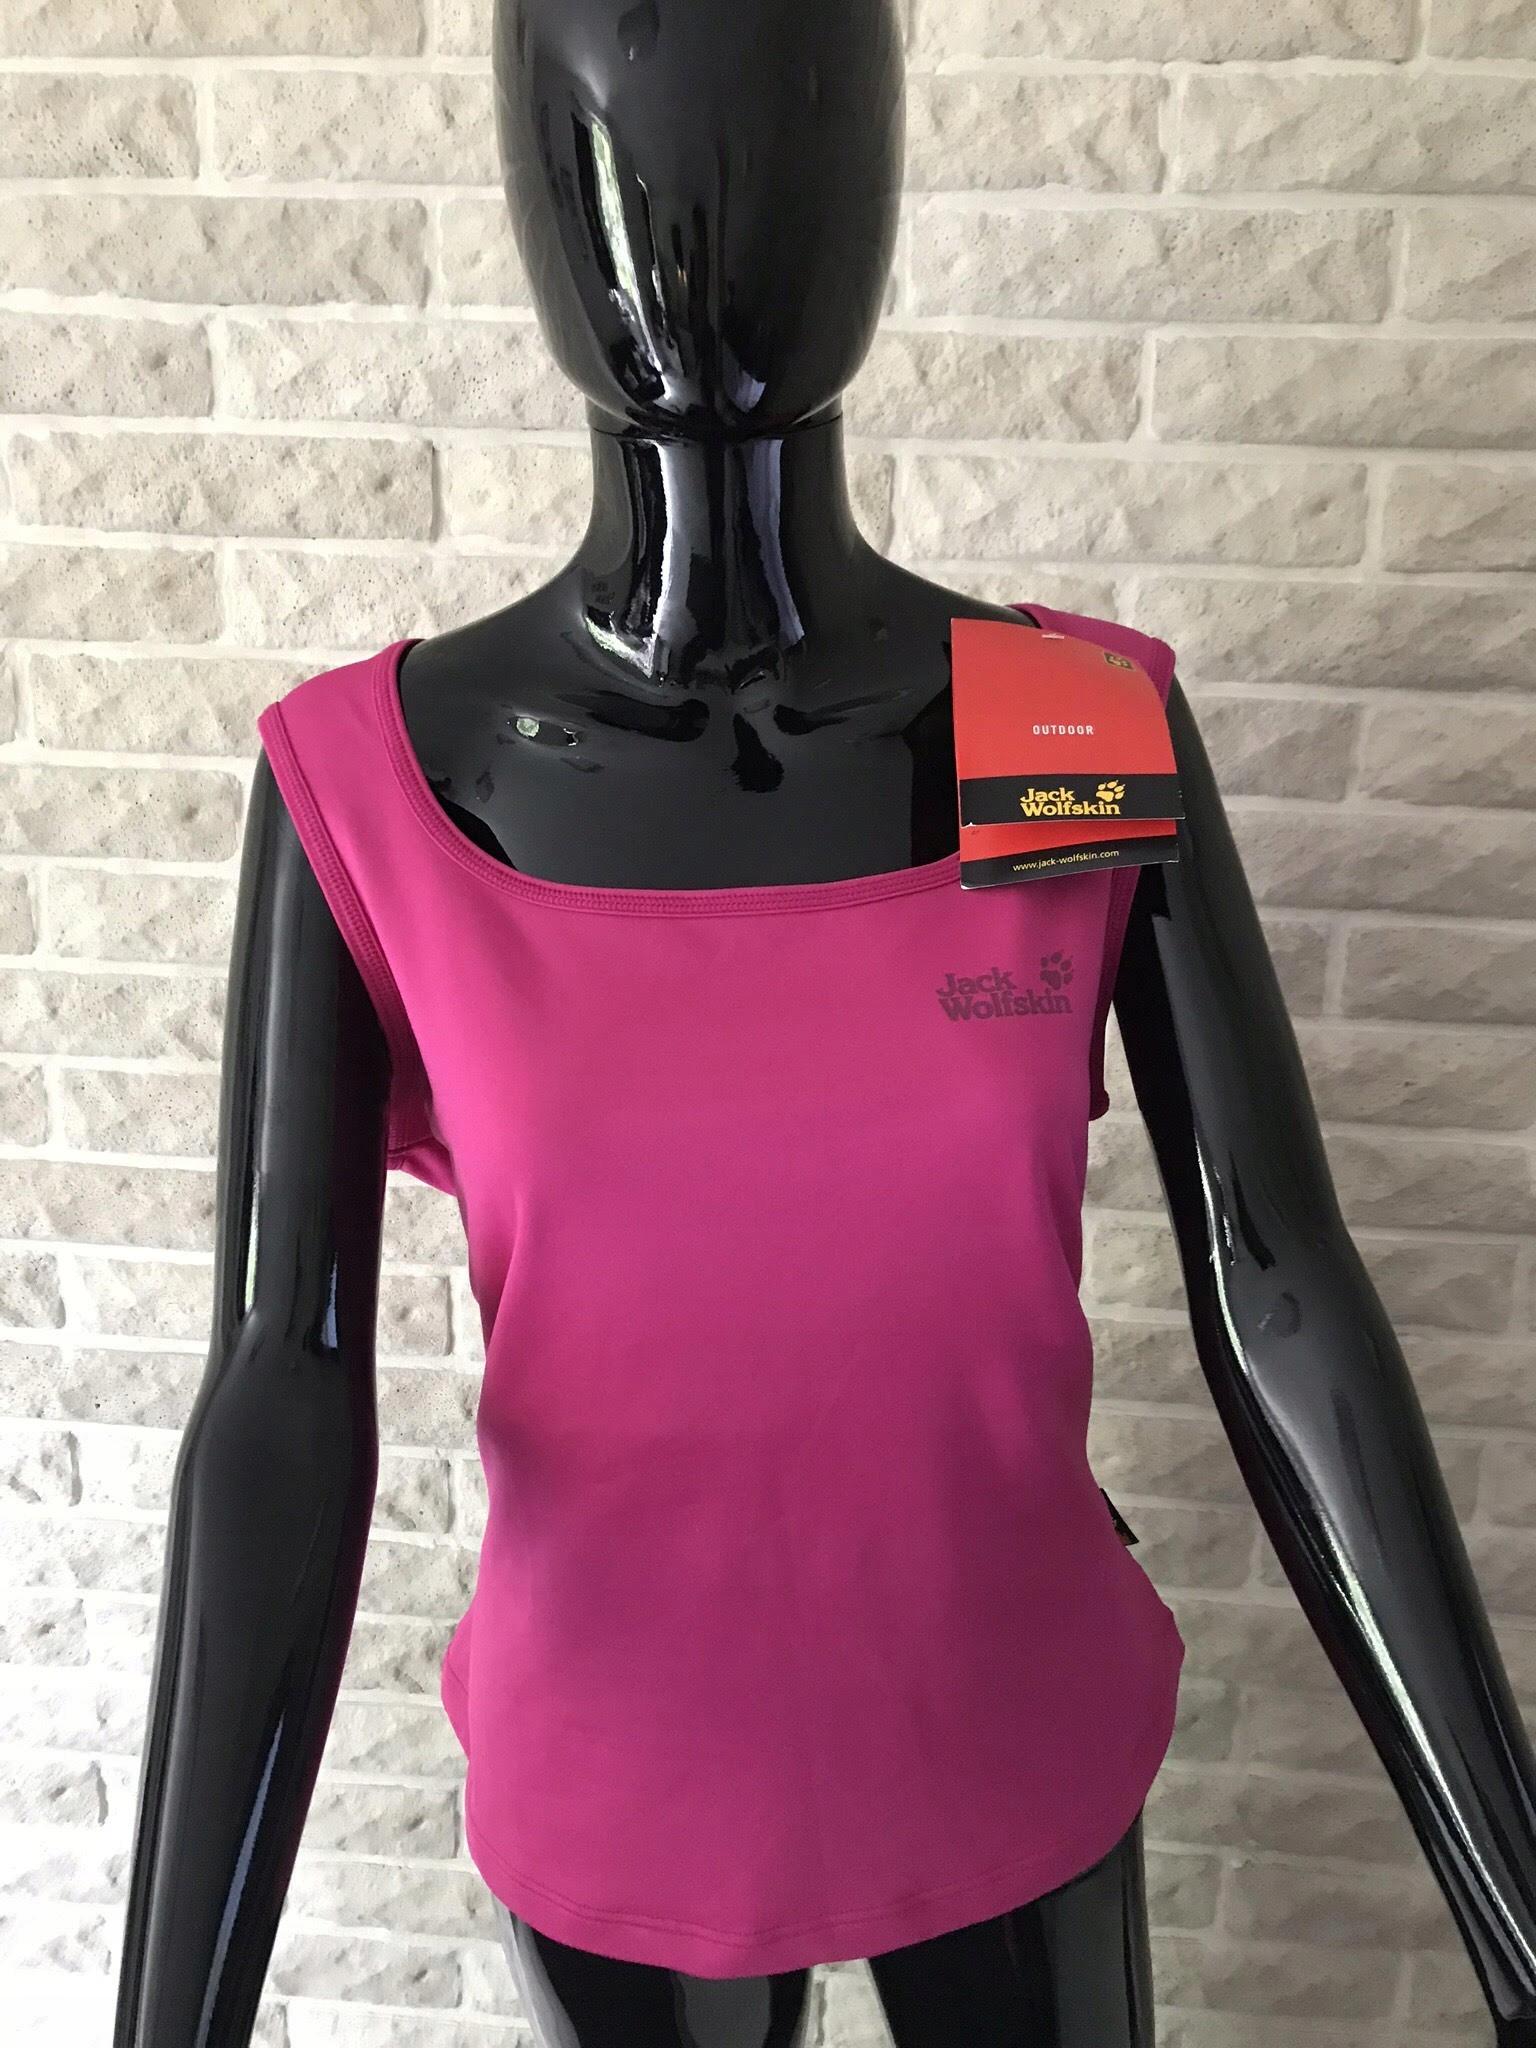 1084606ad7f006 Jack Wolfskin różowa bluzka damska rozmiar XL - 7536033000 ...